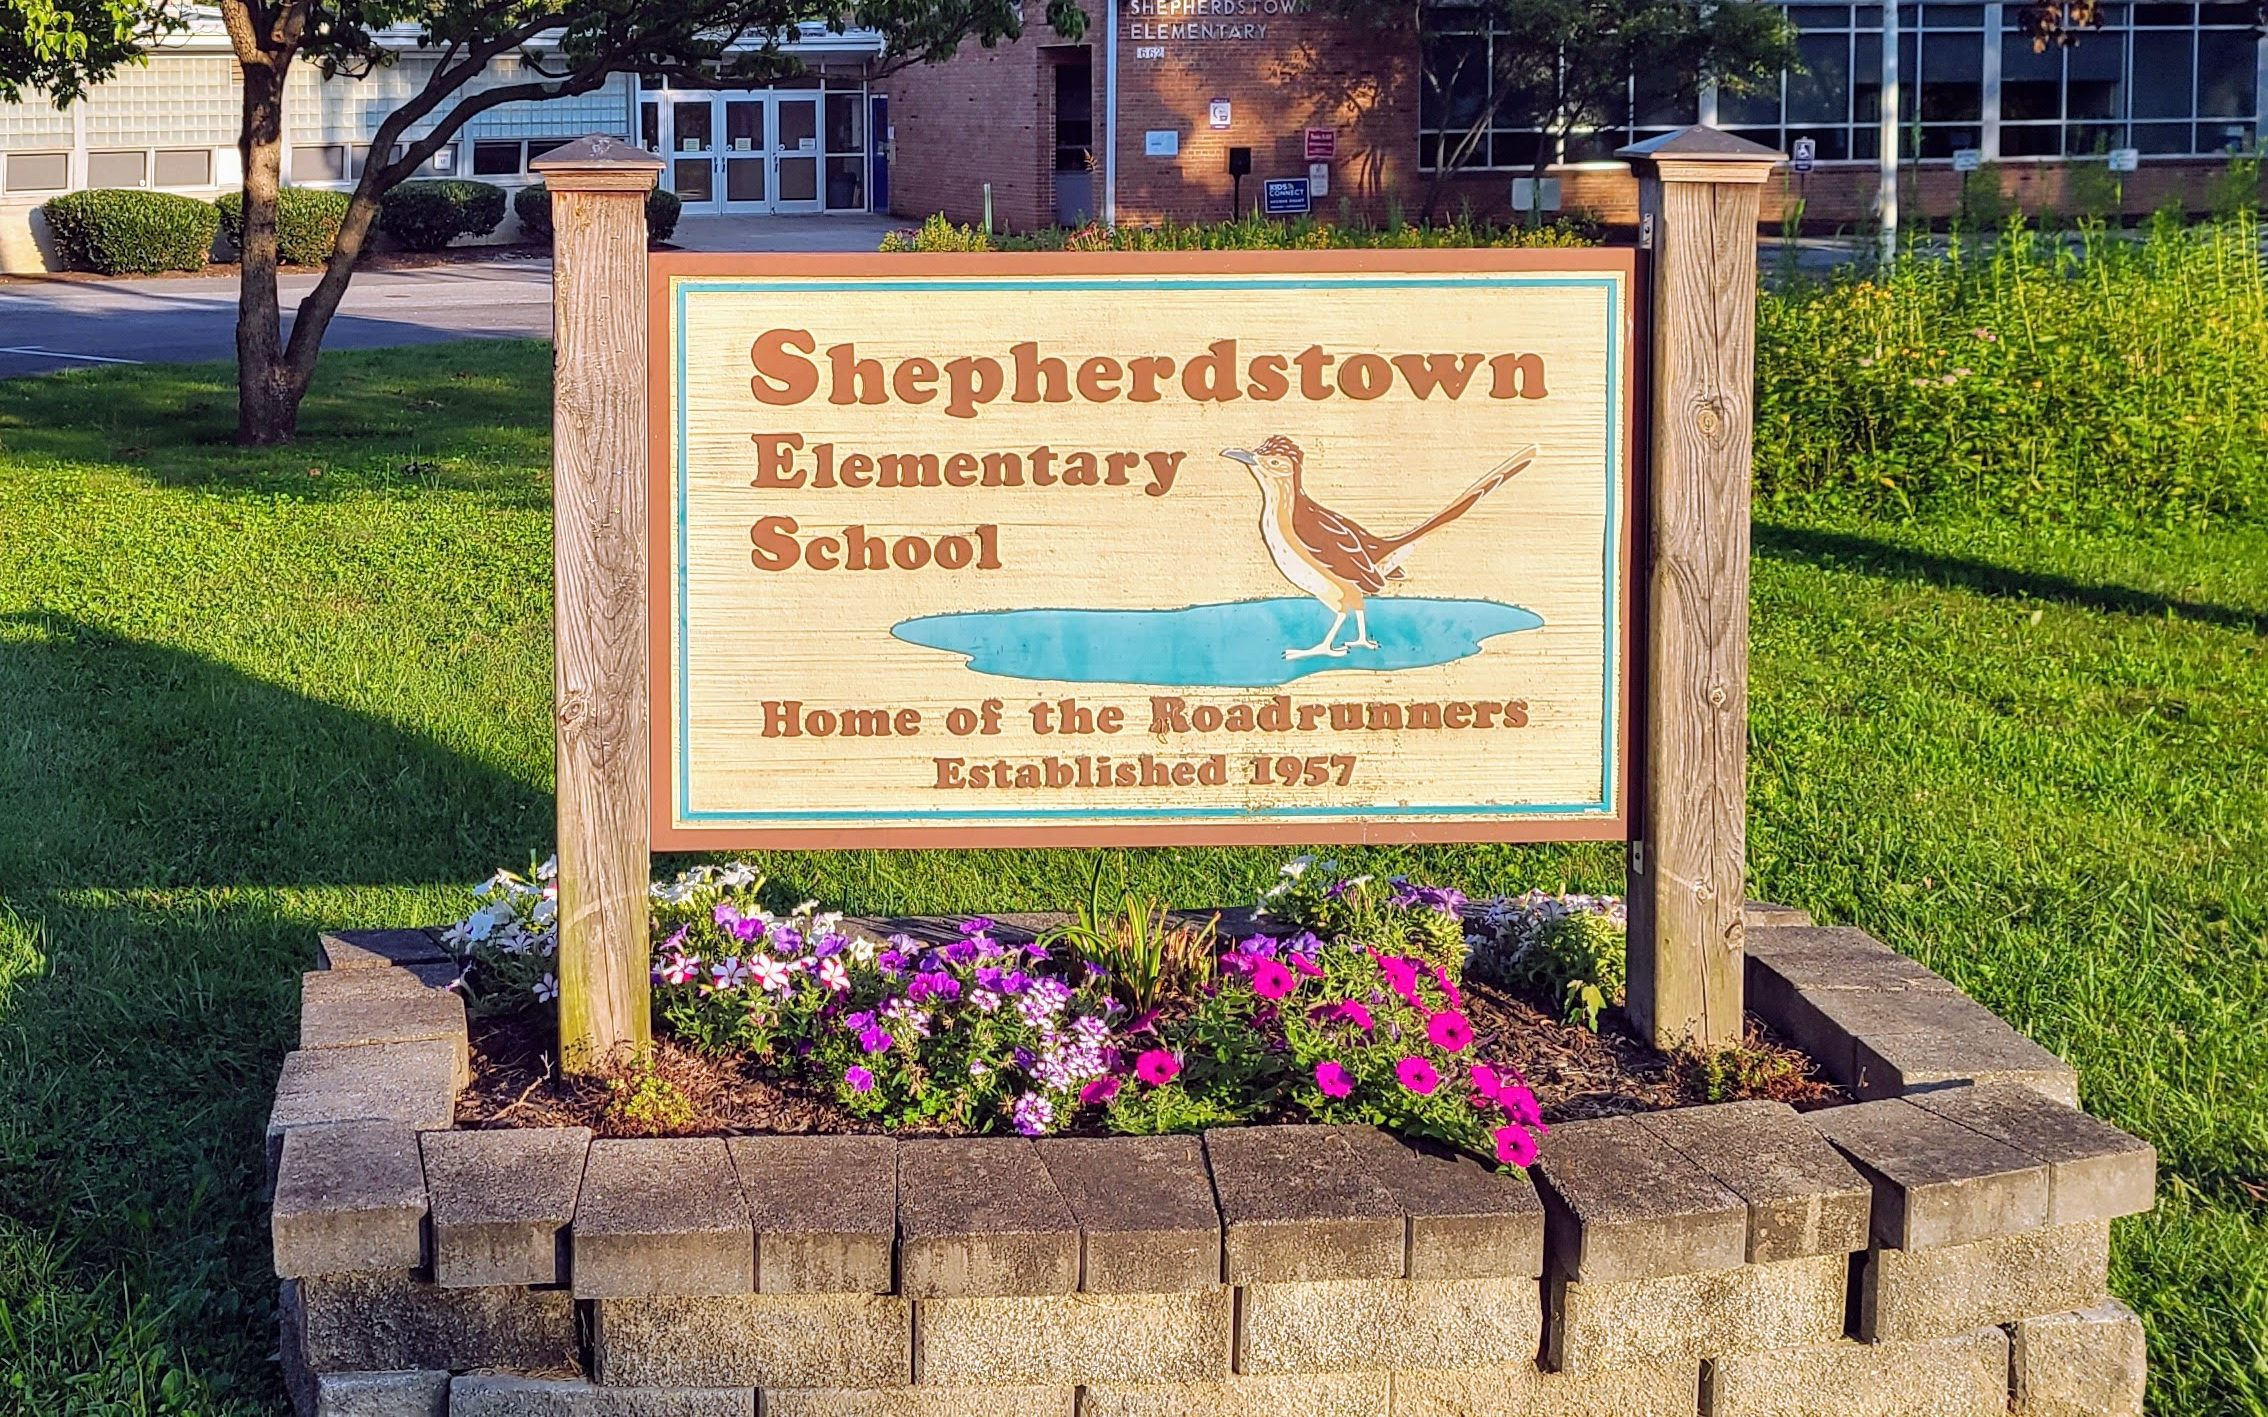 Sign for Shepherdstown Elementary School, established 1957.